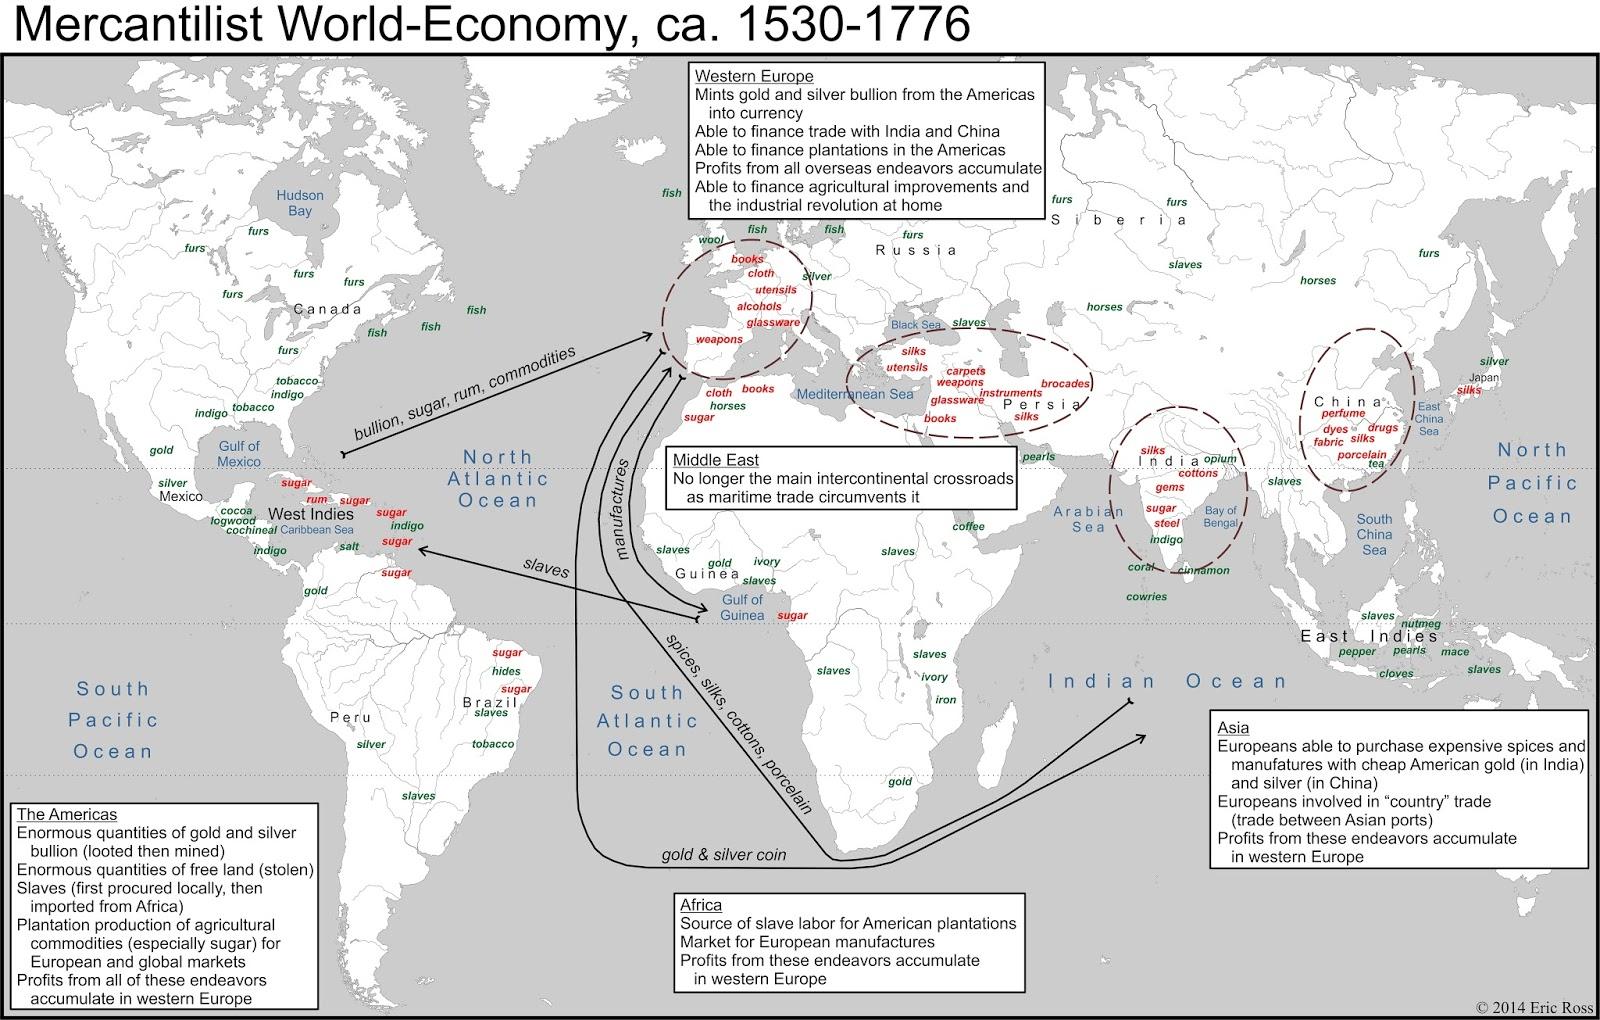 Ciencias sociales colonialismo europeo siglos xvii xviii bibliografia gumiabroncs Image collections